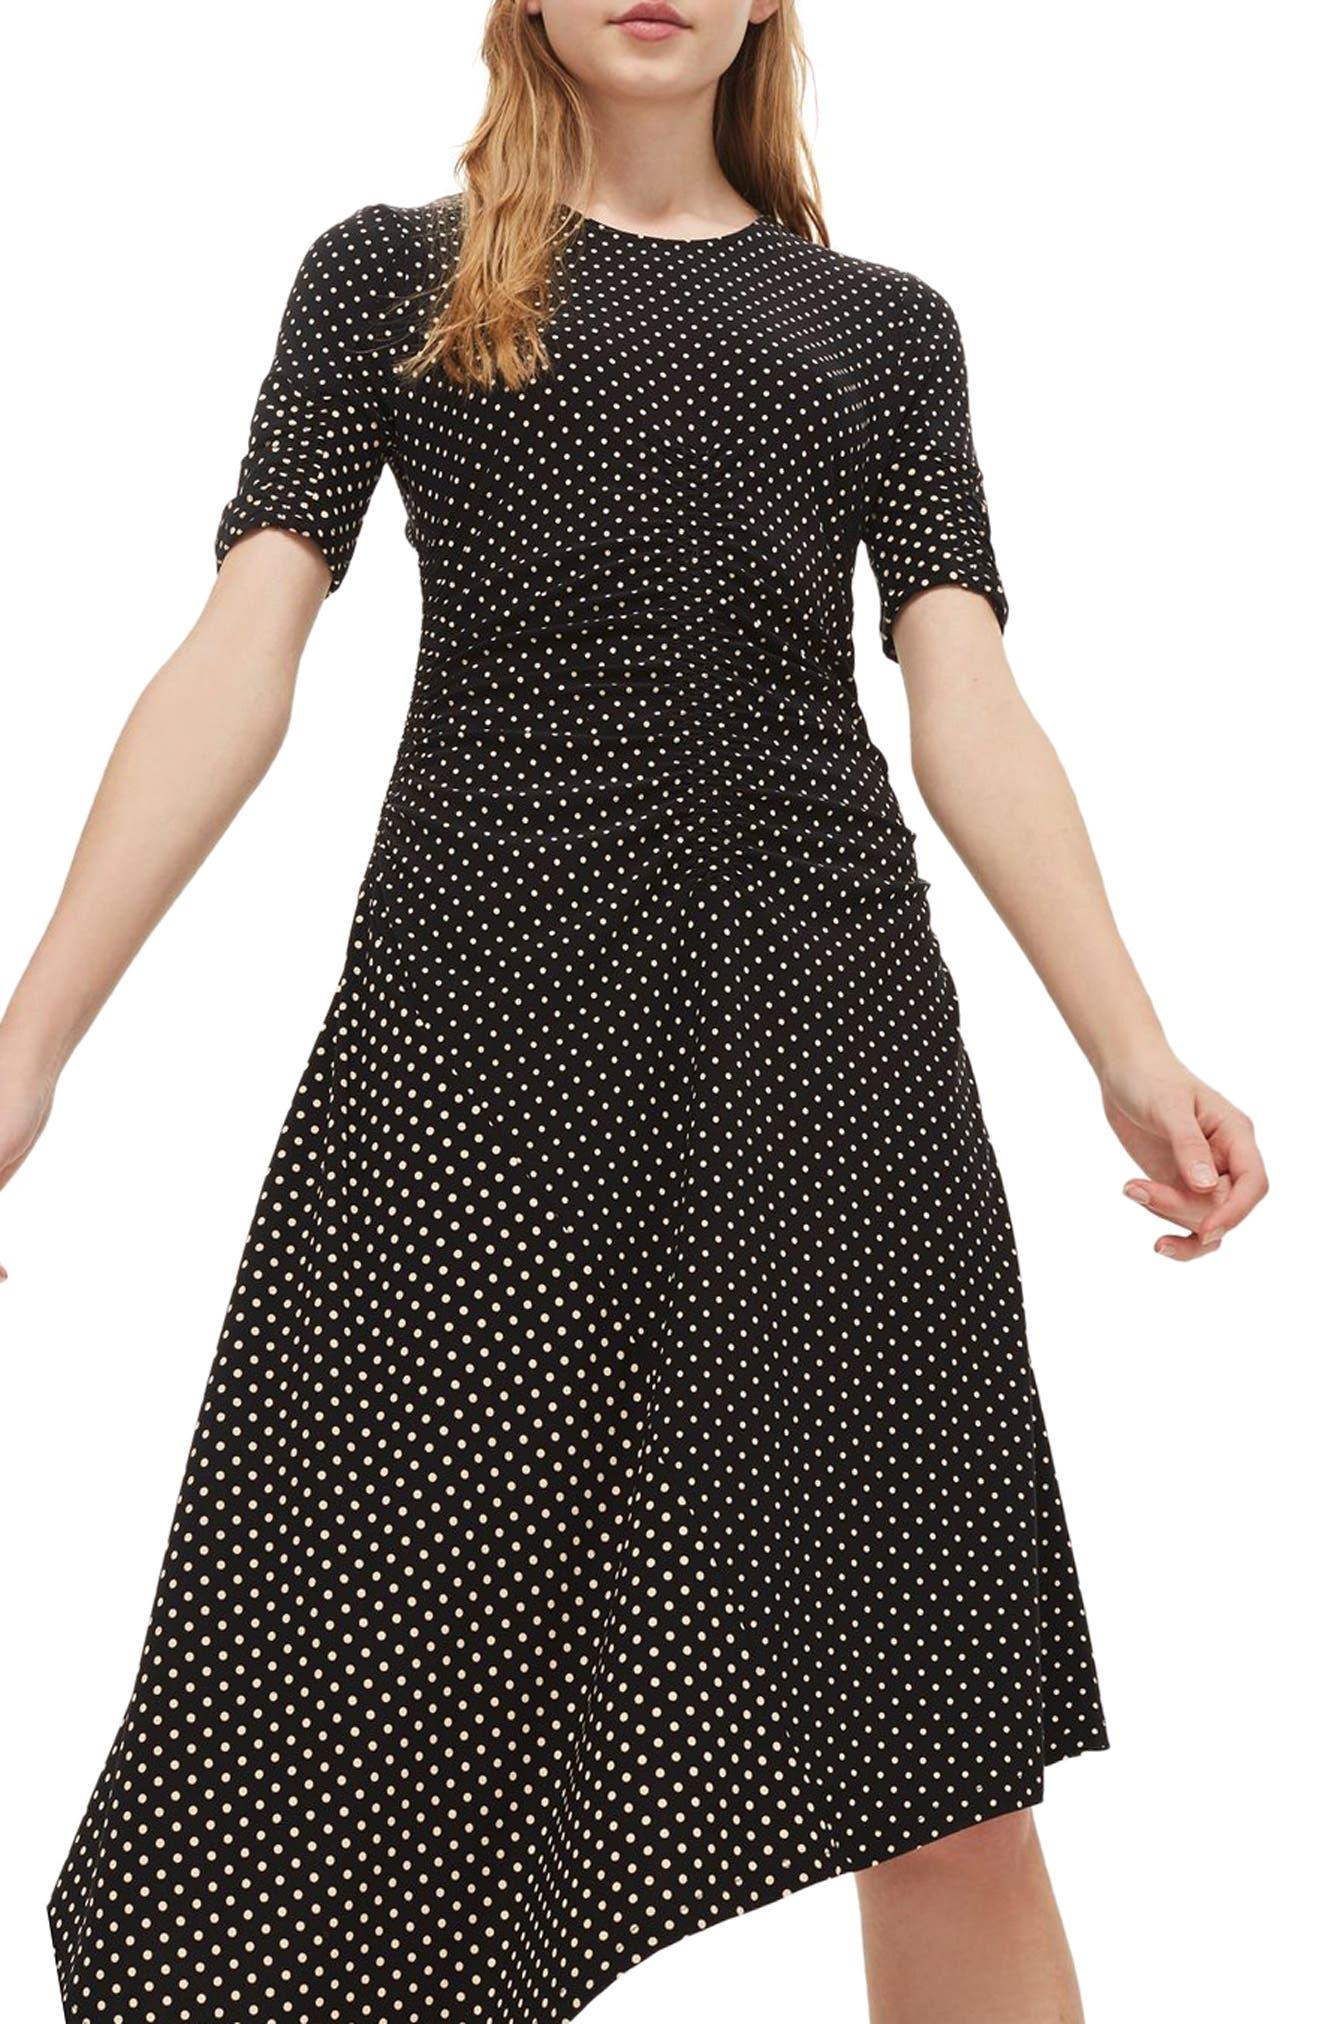 Polka Dot Asymmetrical Midi Dress,                             Main thumbnail 1, color,                             Black Multi